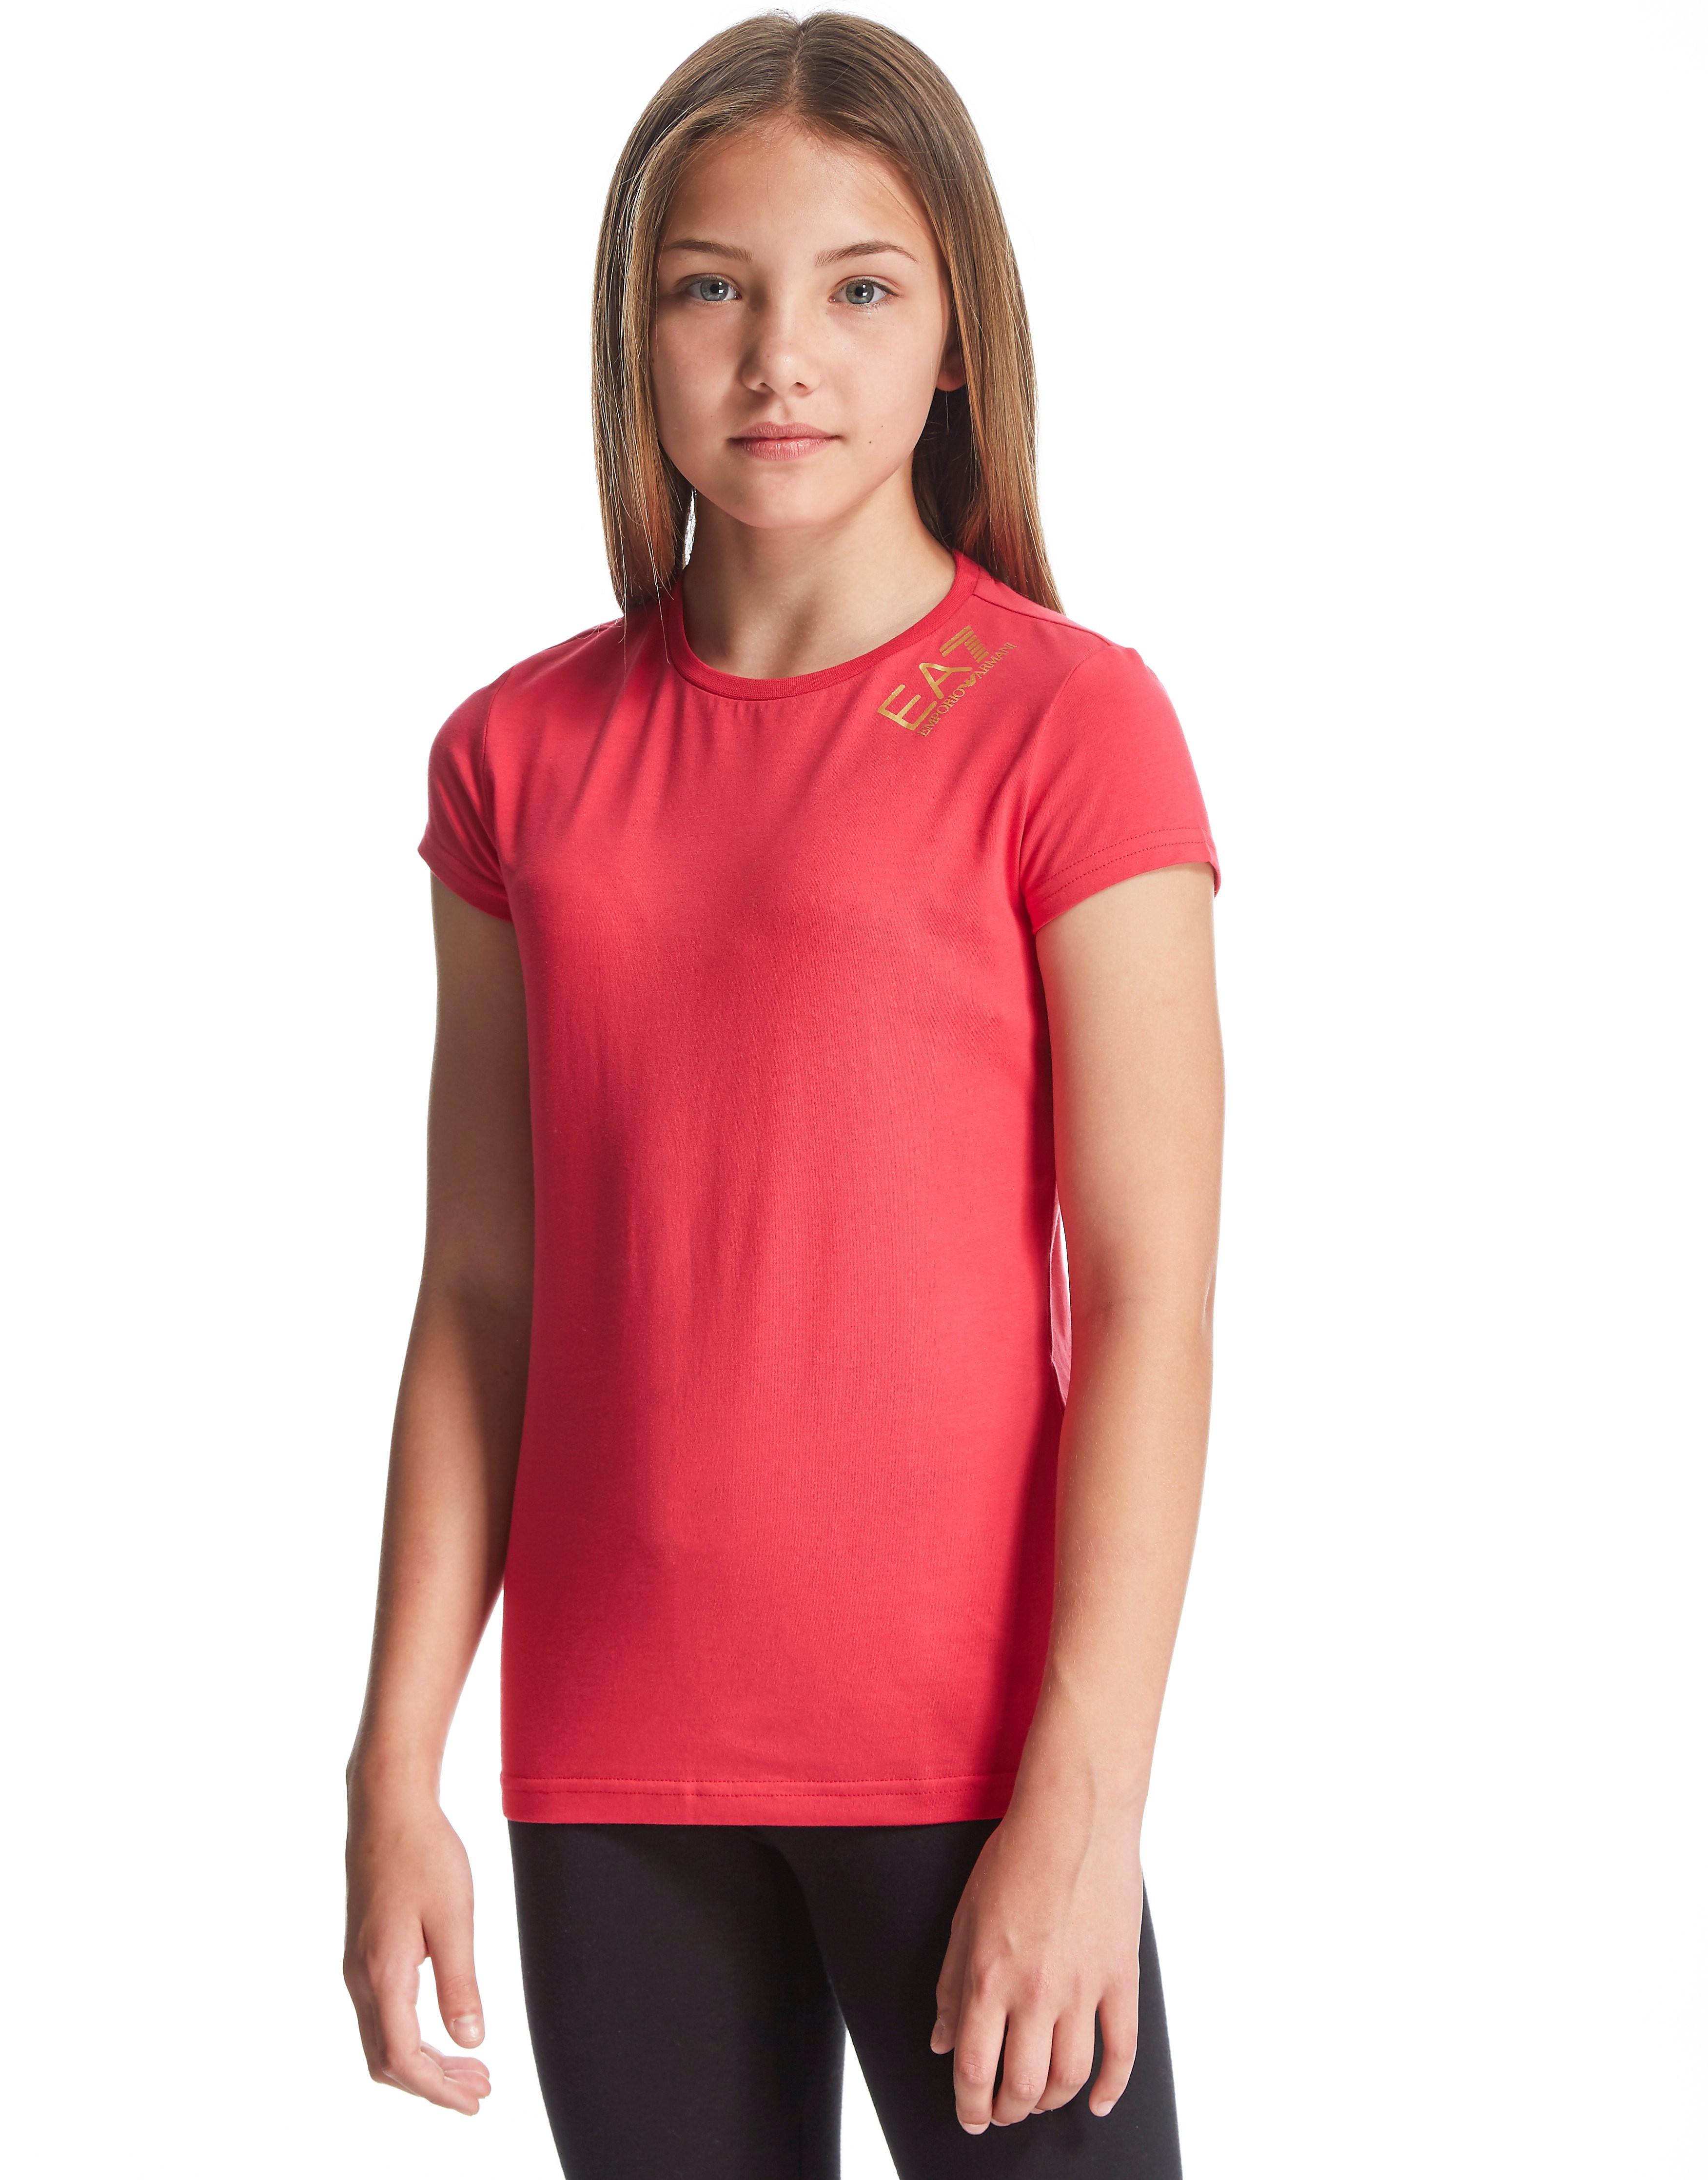 Emporio Armani EA7 Girls' Small Logo T-Shirt Junior